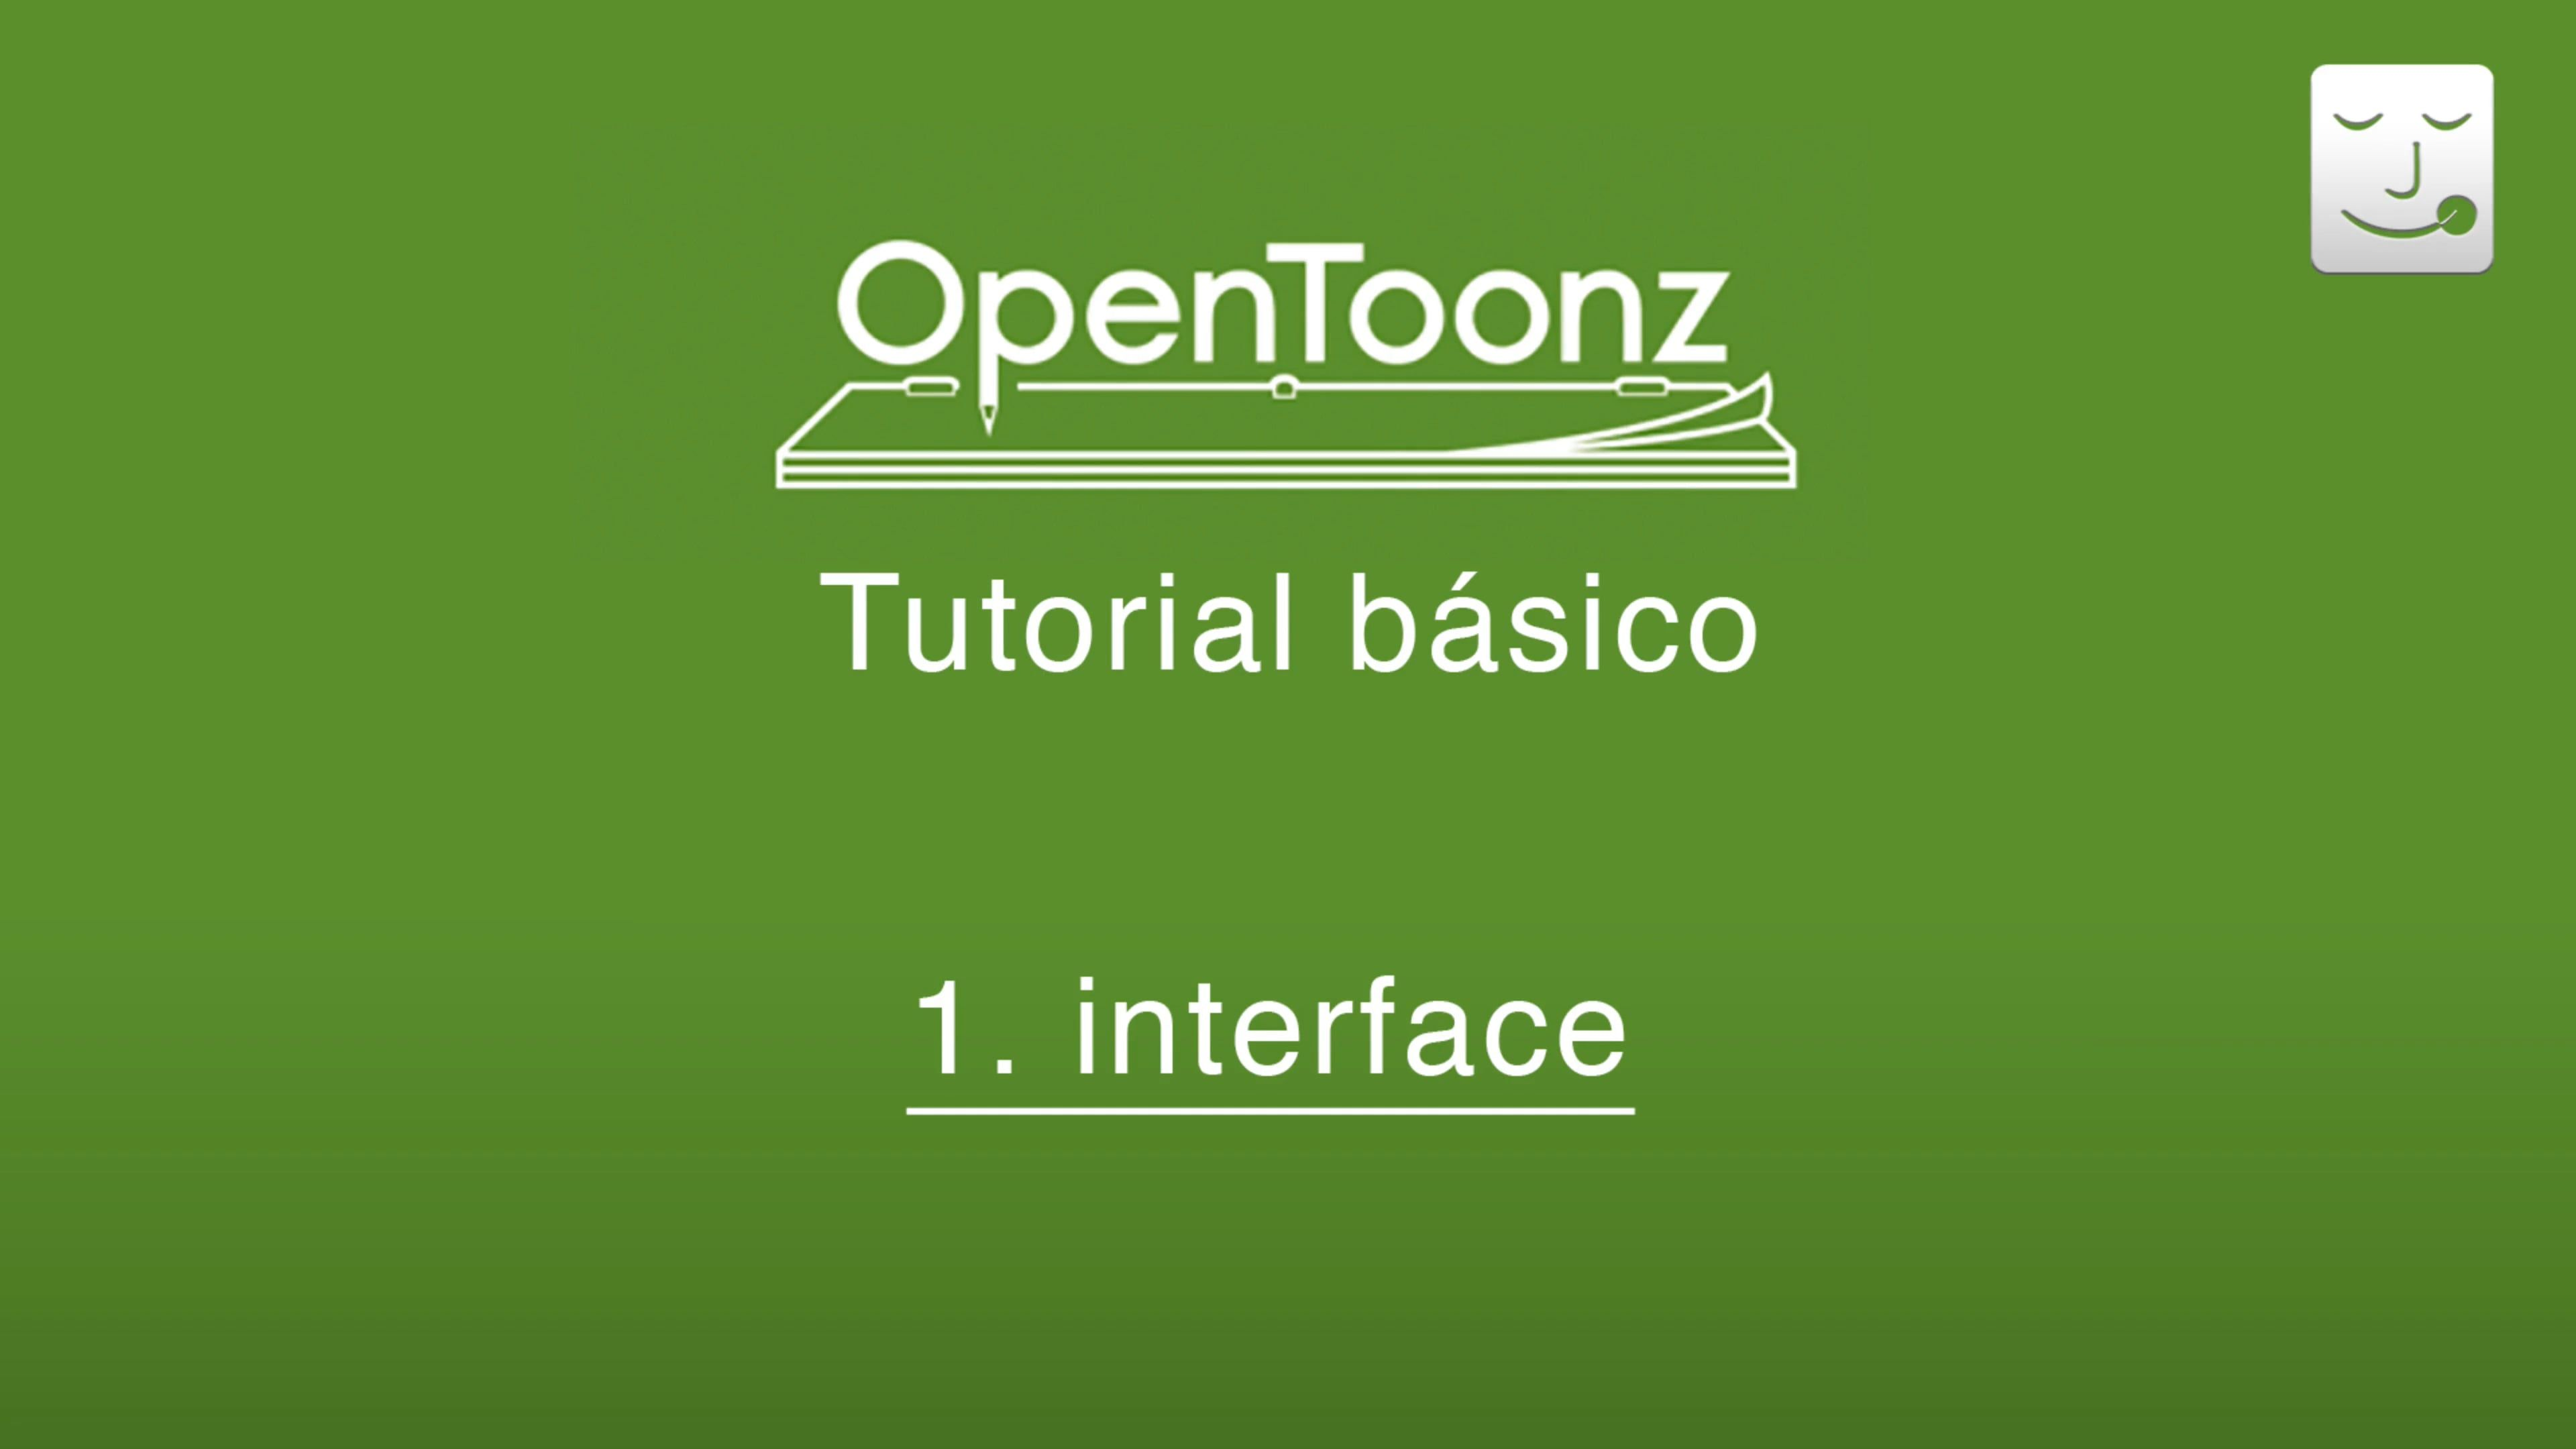 Opentoonz Crea Animaciónes 2d Gratis Animacion Español Español 1